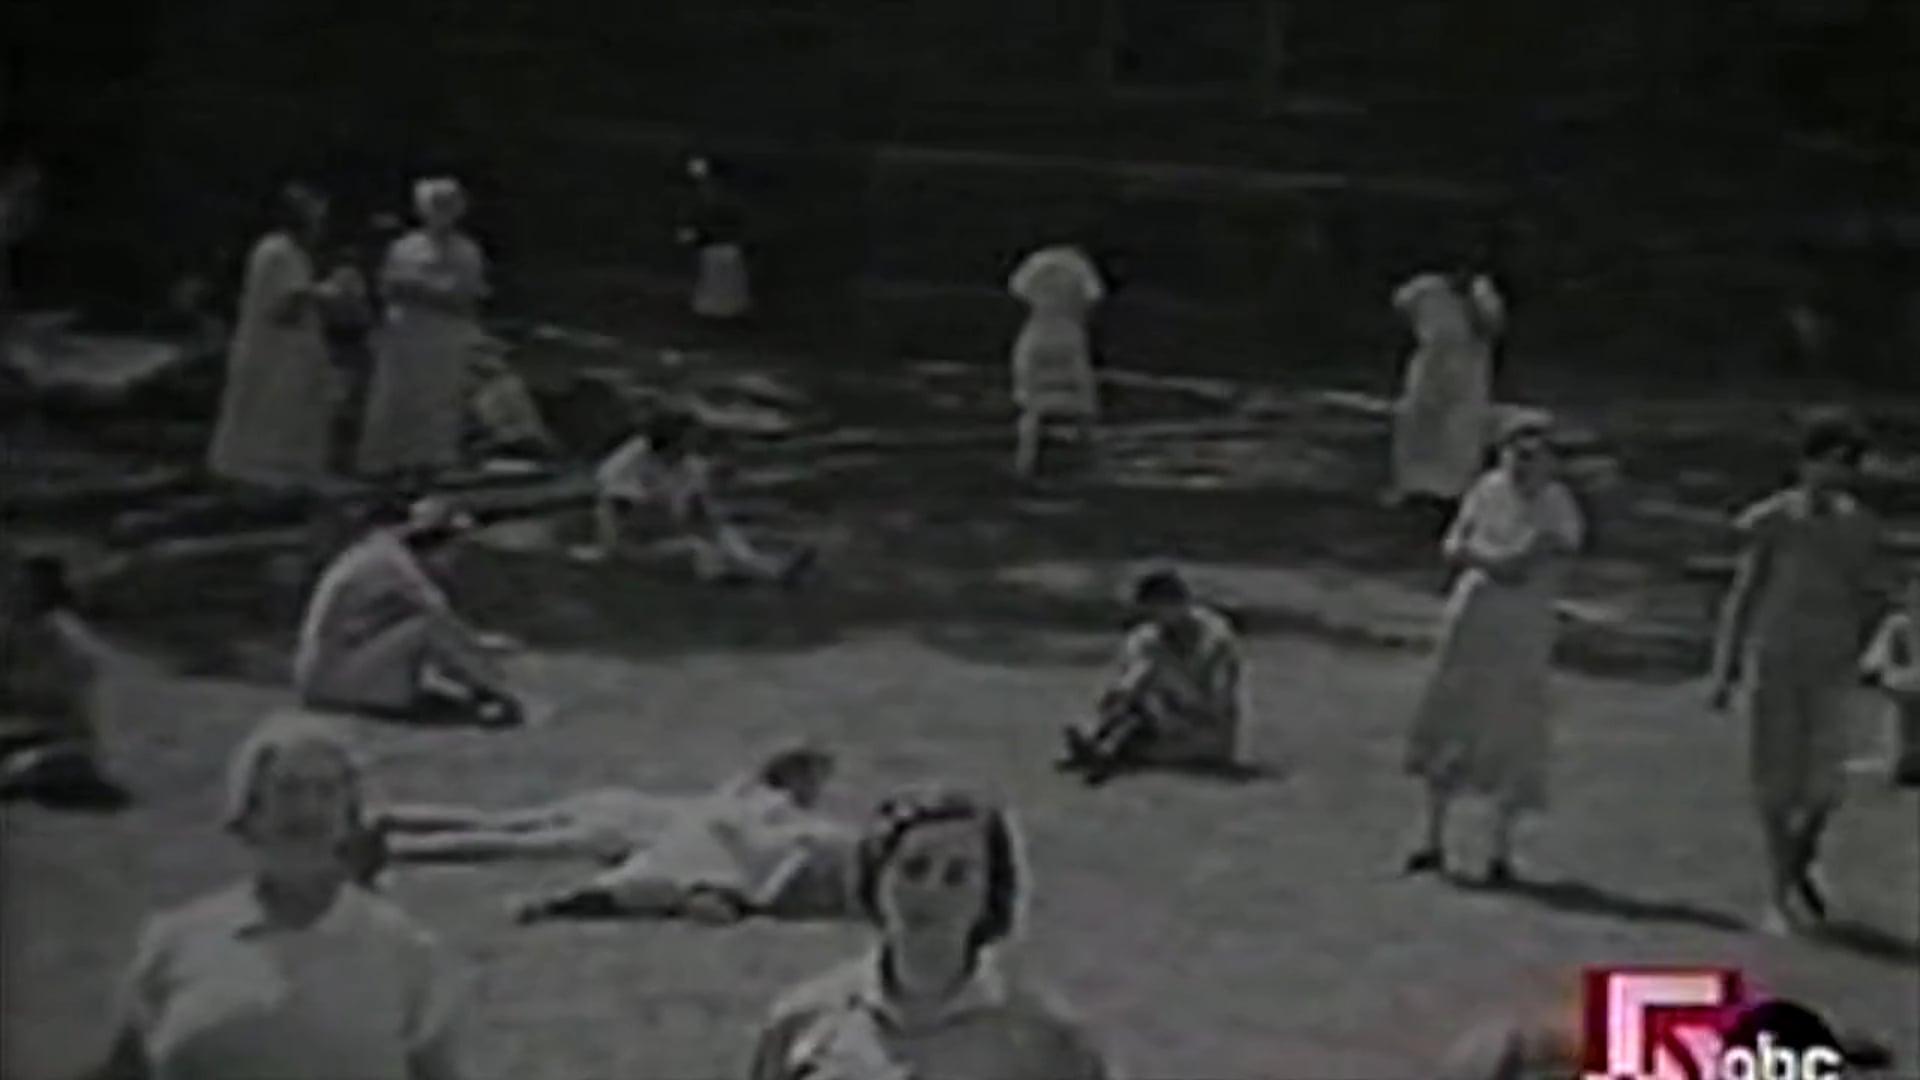 Danvers featured on Boston's Channel 5 2005